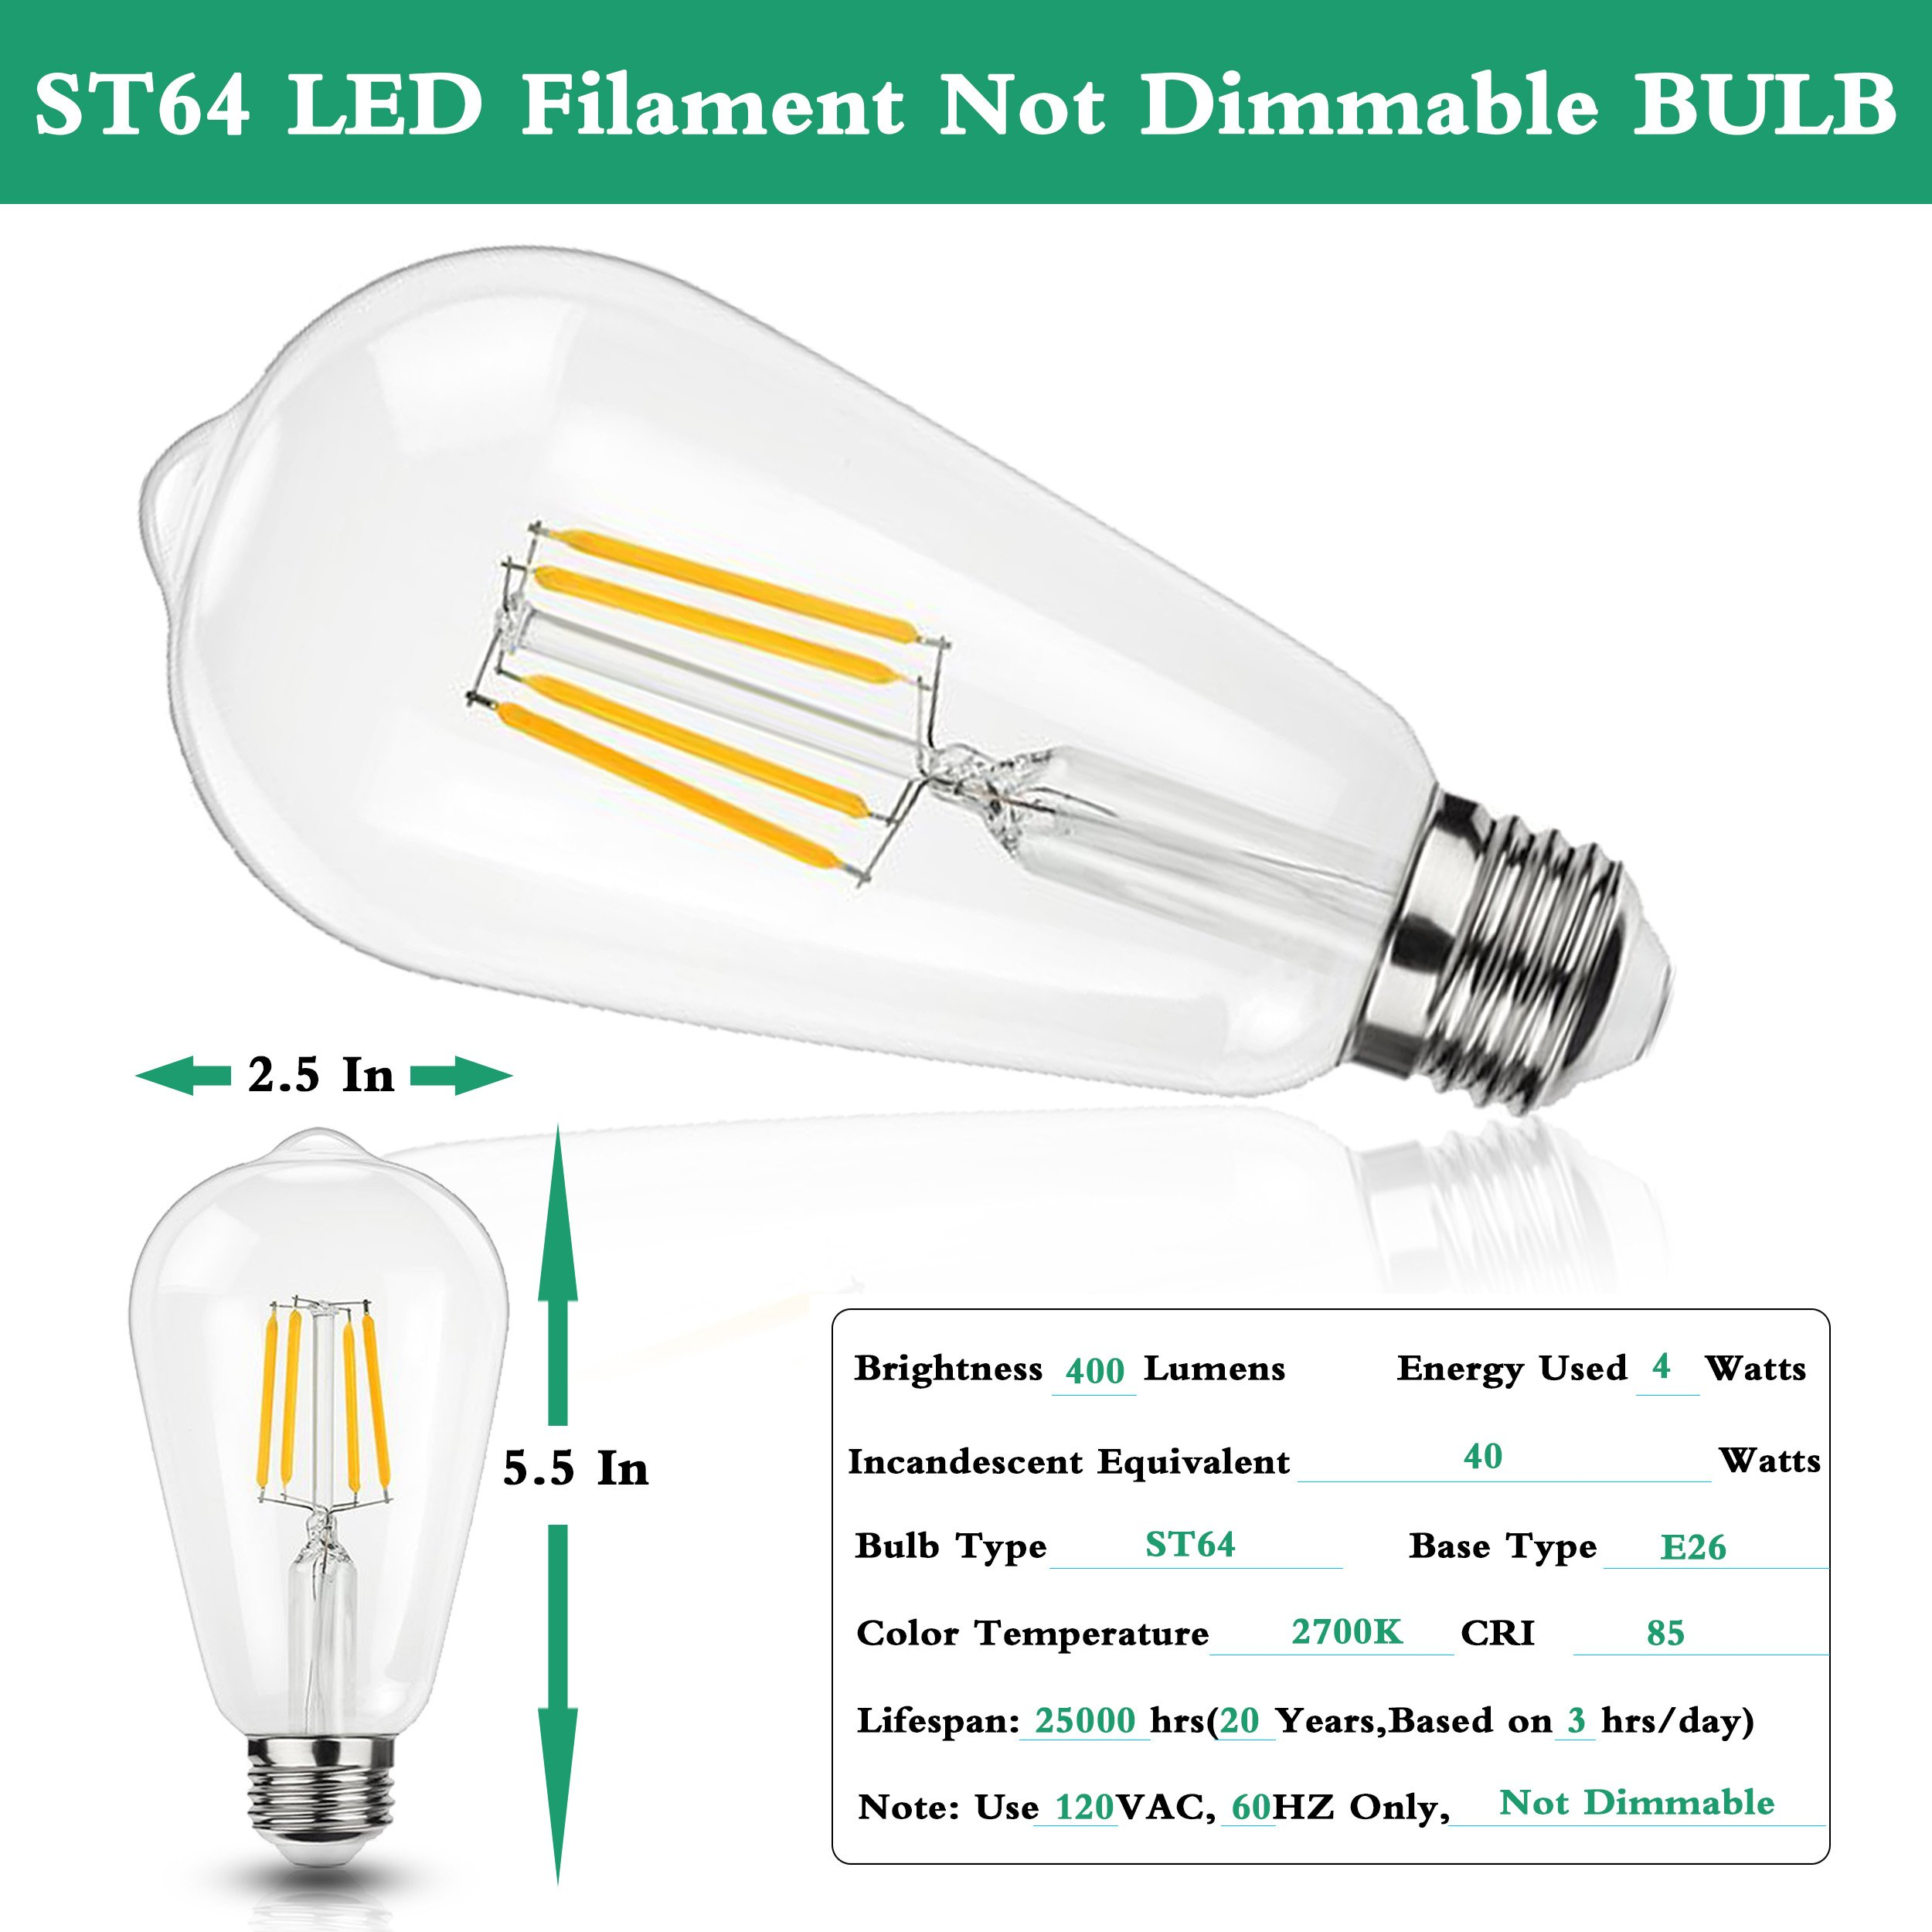 Vintage LED Edison Bulbs, ST64 LED Filament Light Bulb,2700k Soft White,4W ST21 LED Bulbs,400LM, 40W Halogen Equivalent, Non Dimmable E26 Base Clear Glass Bulbs for Hone Bathroom,Bedroom-12 Pack